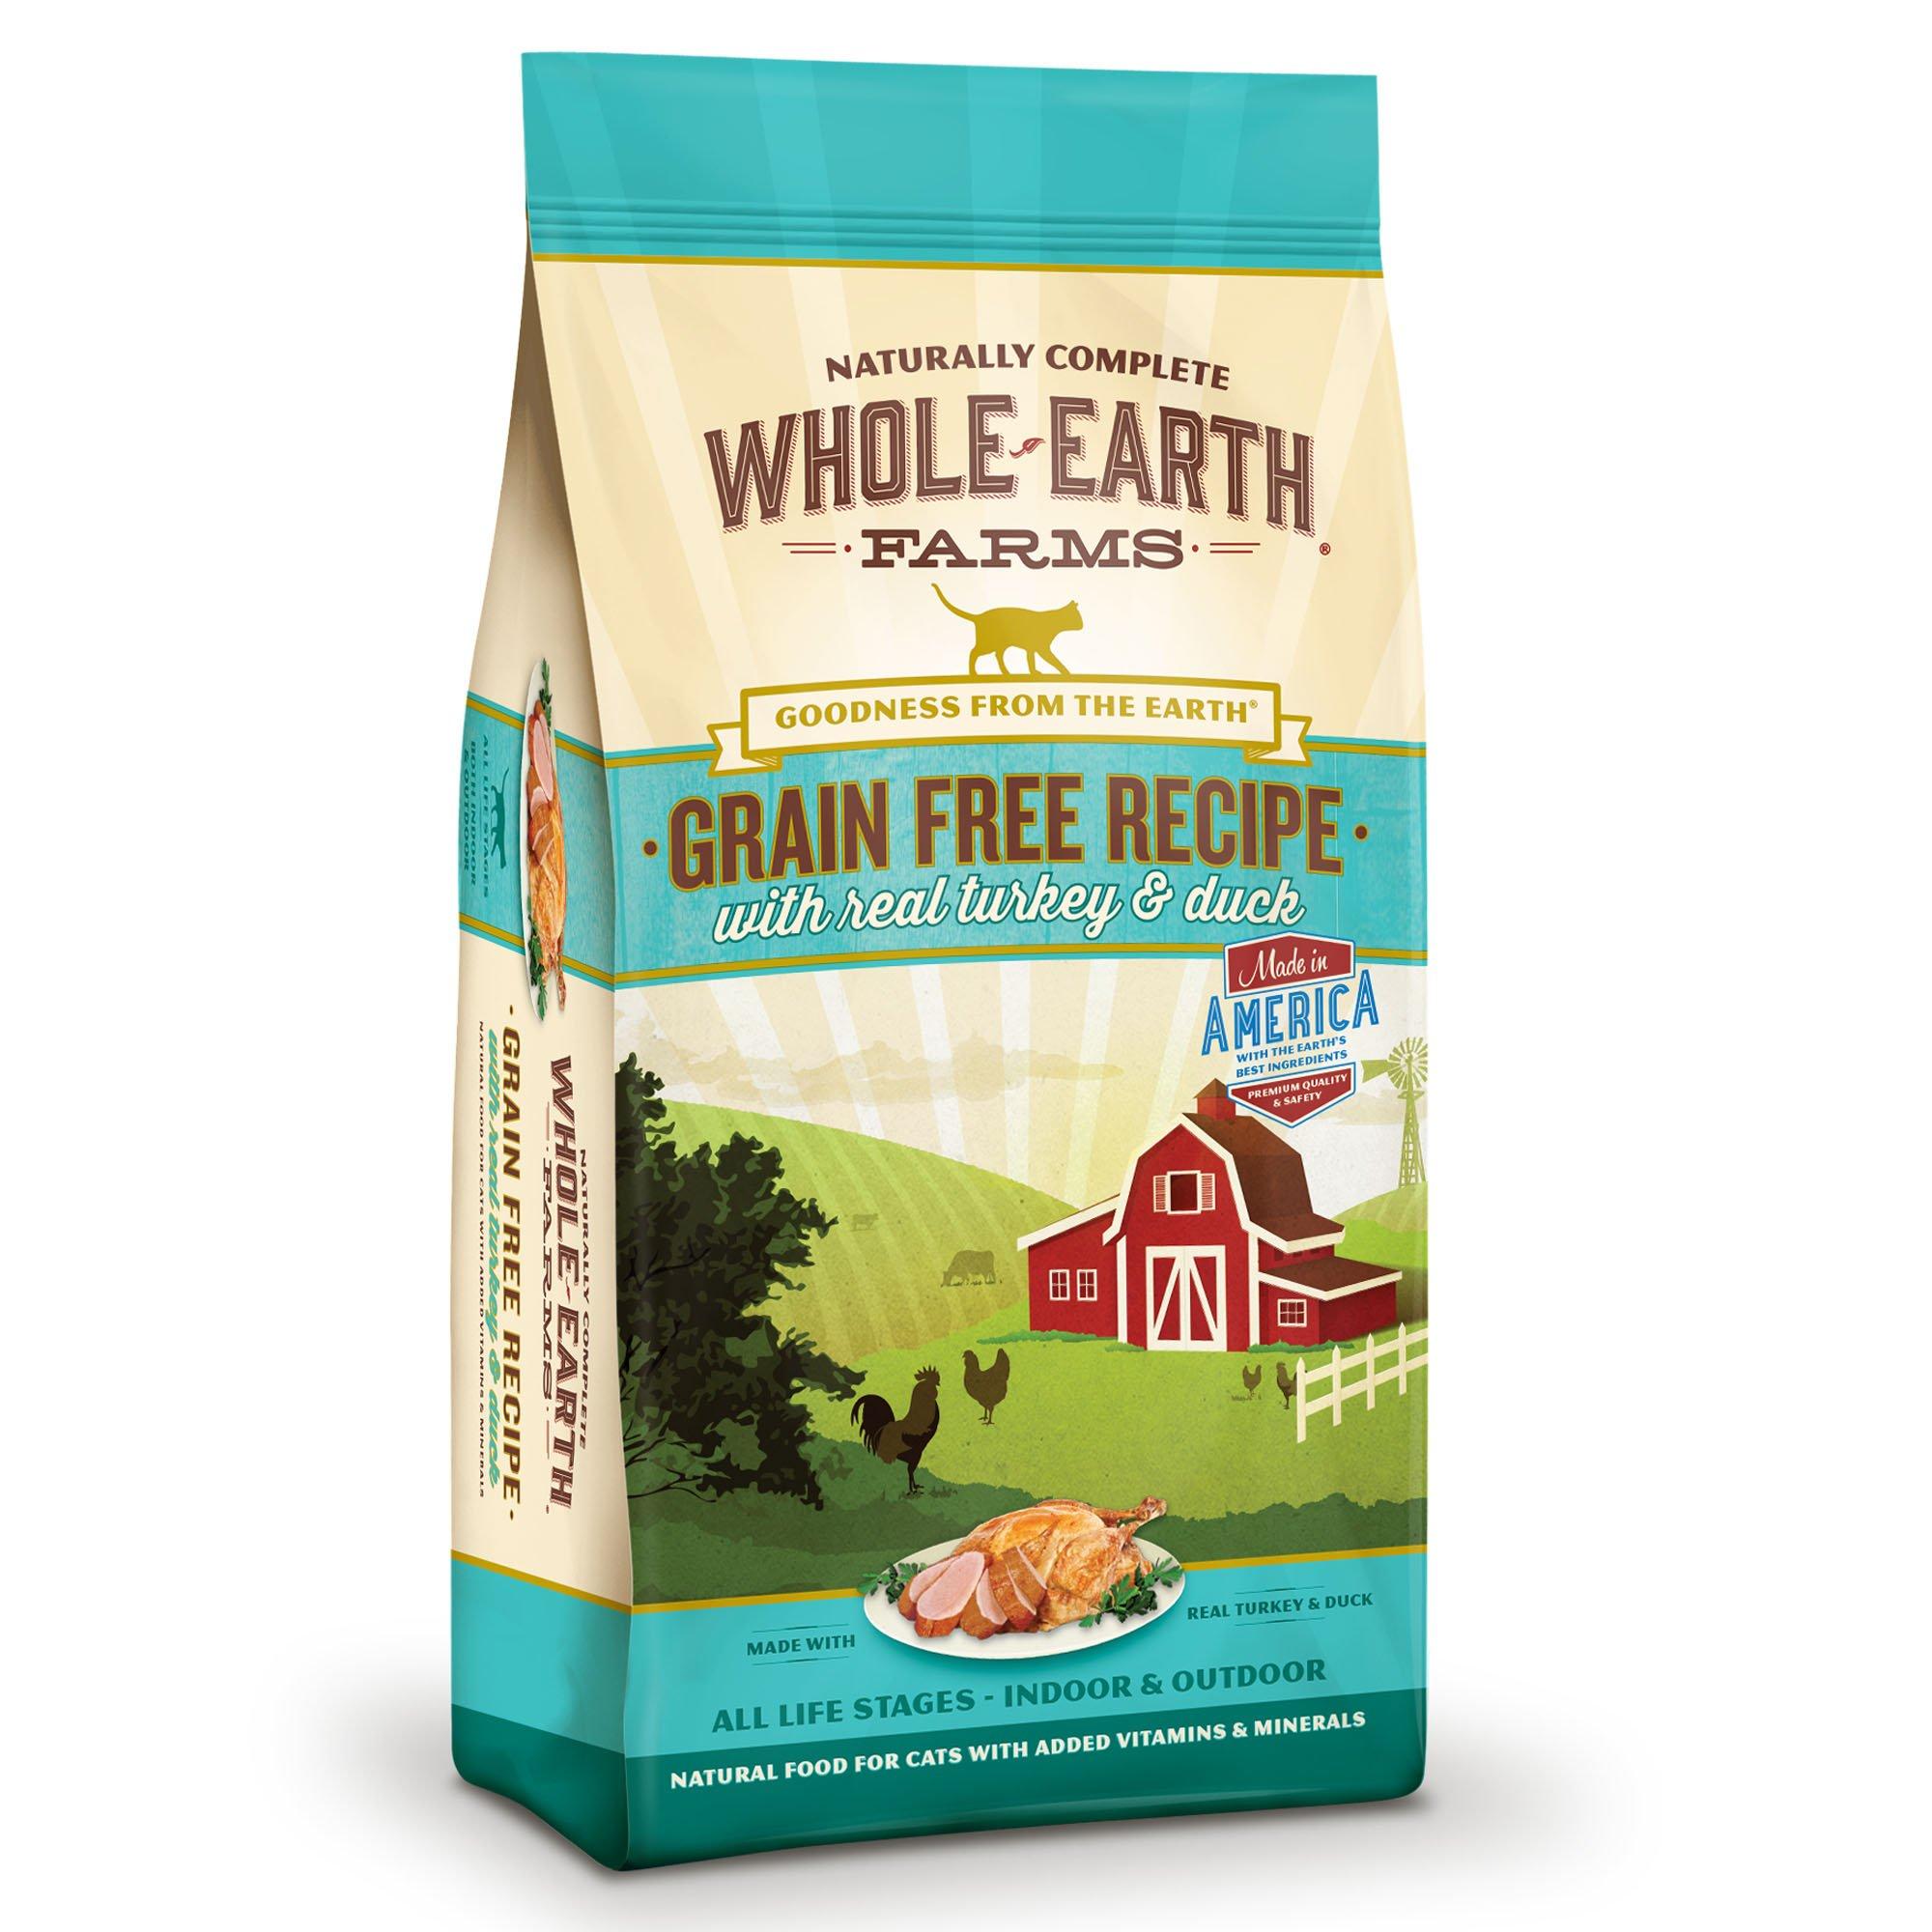 Whole-Earth-Farms-Grain-Free-Real-Turkey-amp-Duck-Cat-Food thumbnail 7